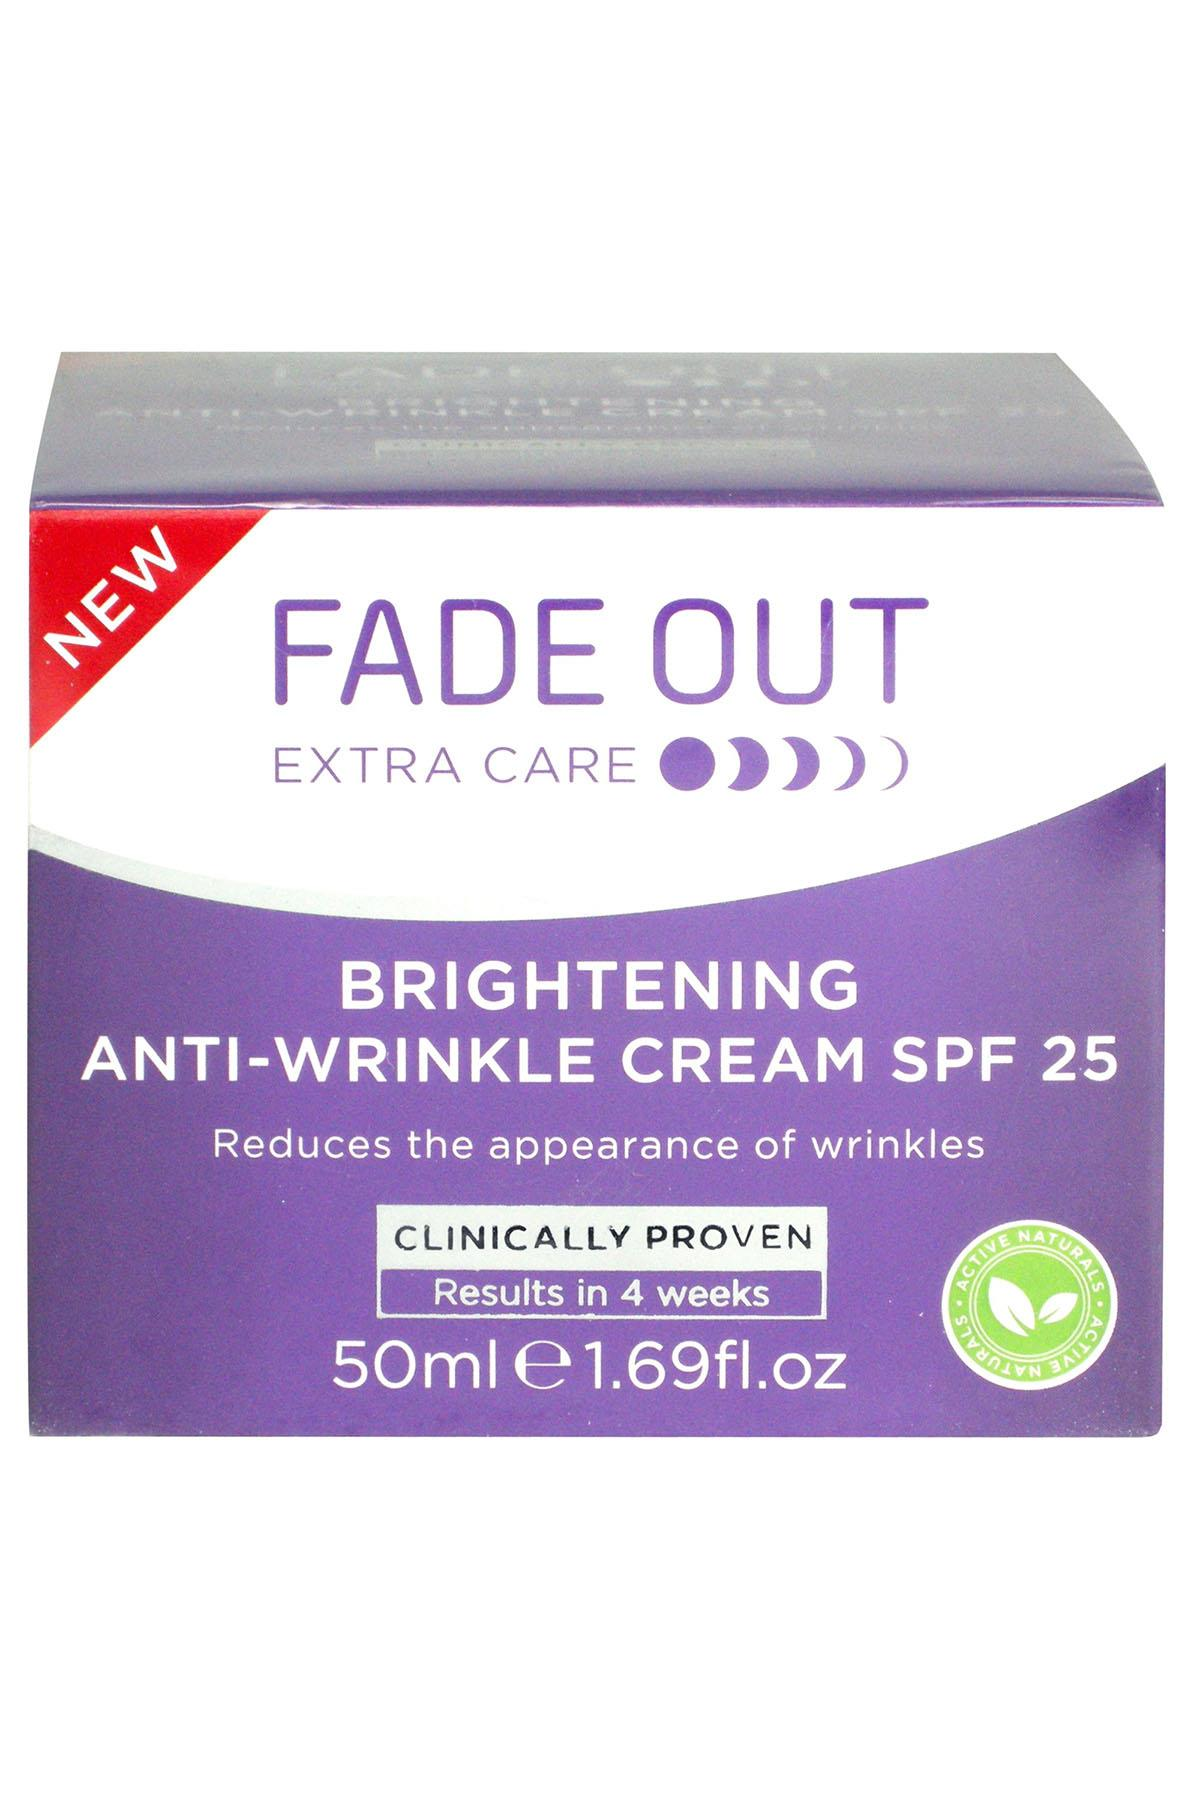 Fade Out Rejuvenating Kırışıklıklara Karşı Krem 50 ml